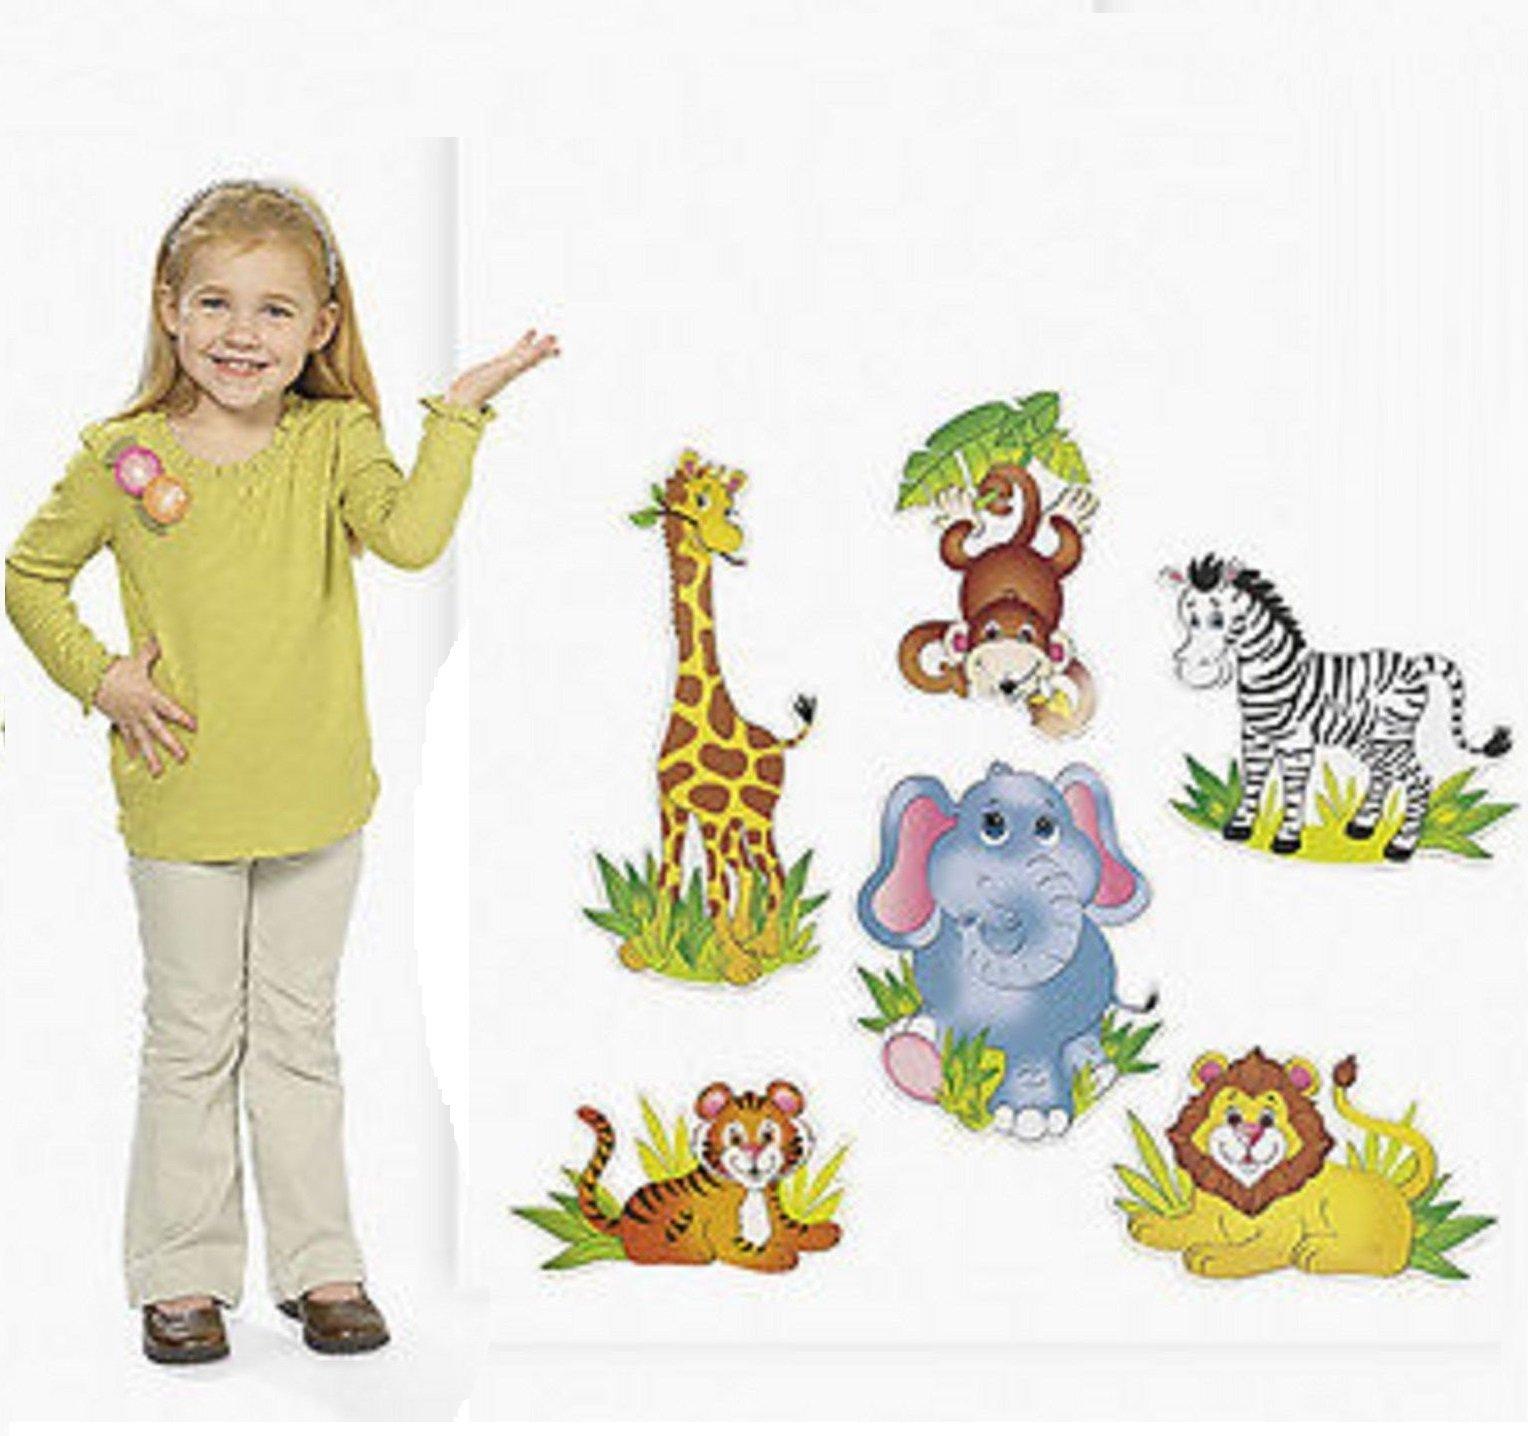 thaisan7, SAFARI zoo ANIMAL CUTOUT DECORATIONS (LOT OF 6) NEW Babys kid children Room, Jungle zoo Birthday Party